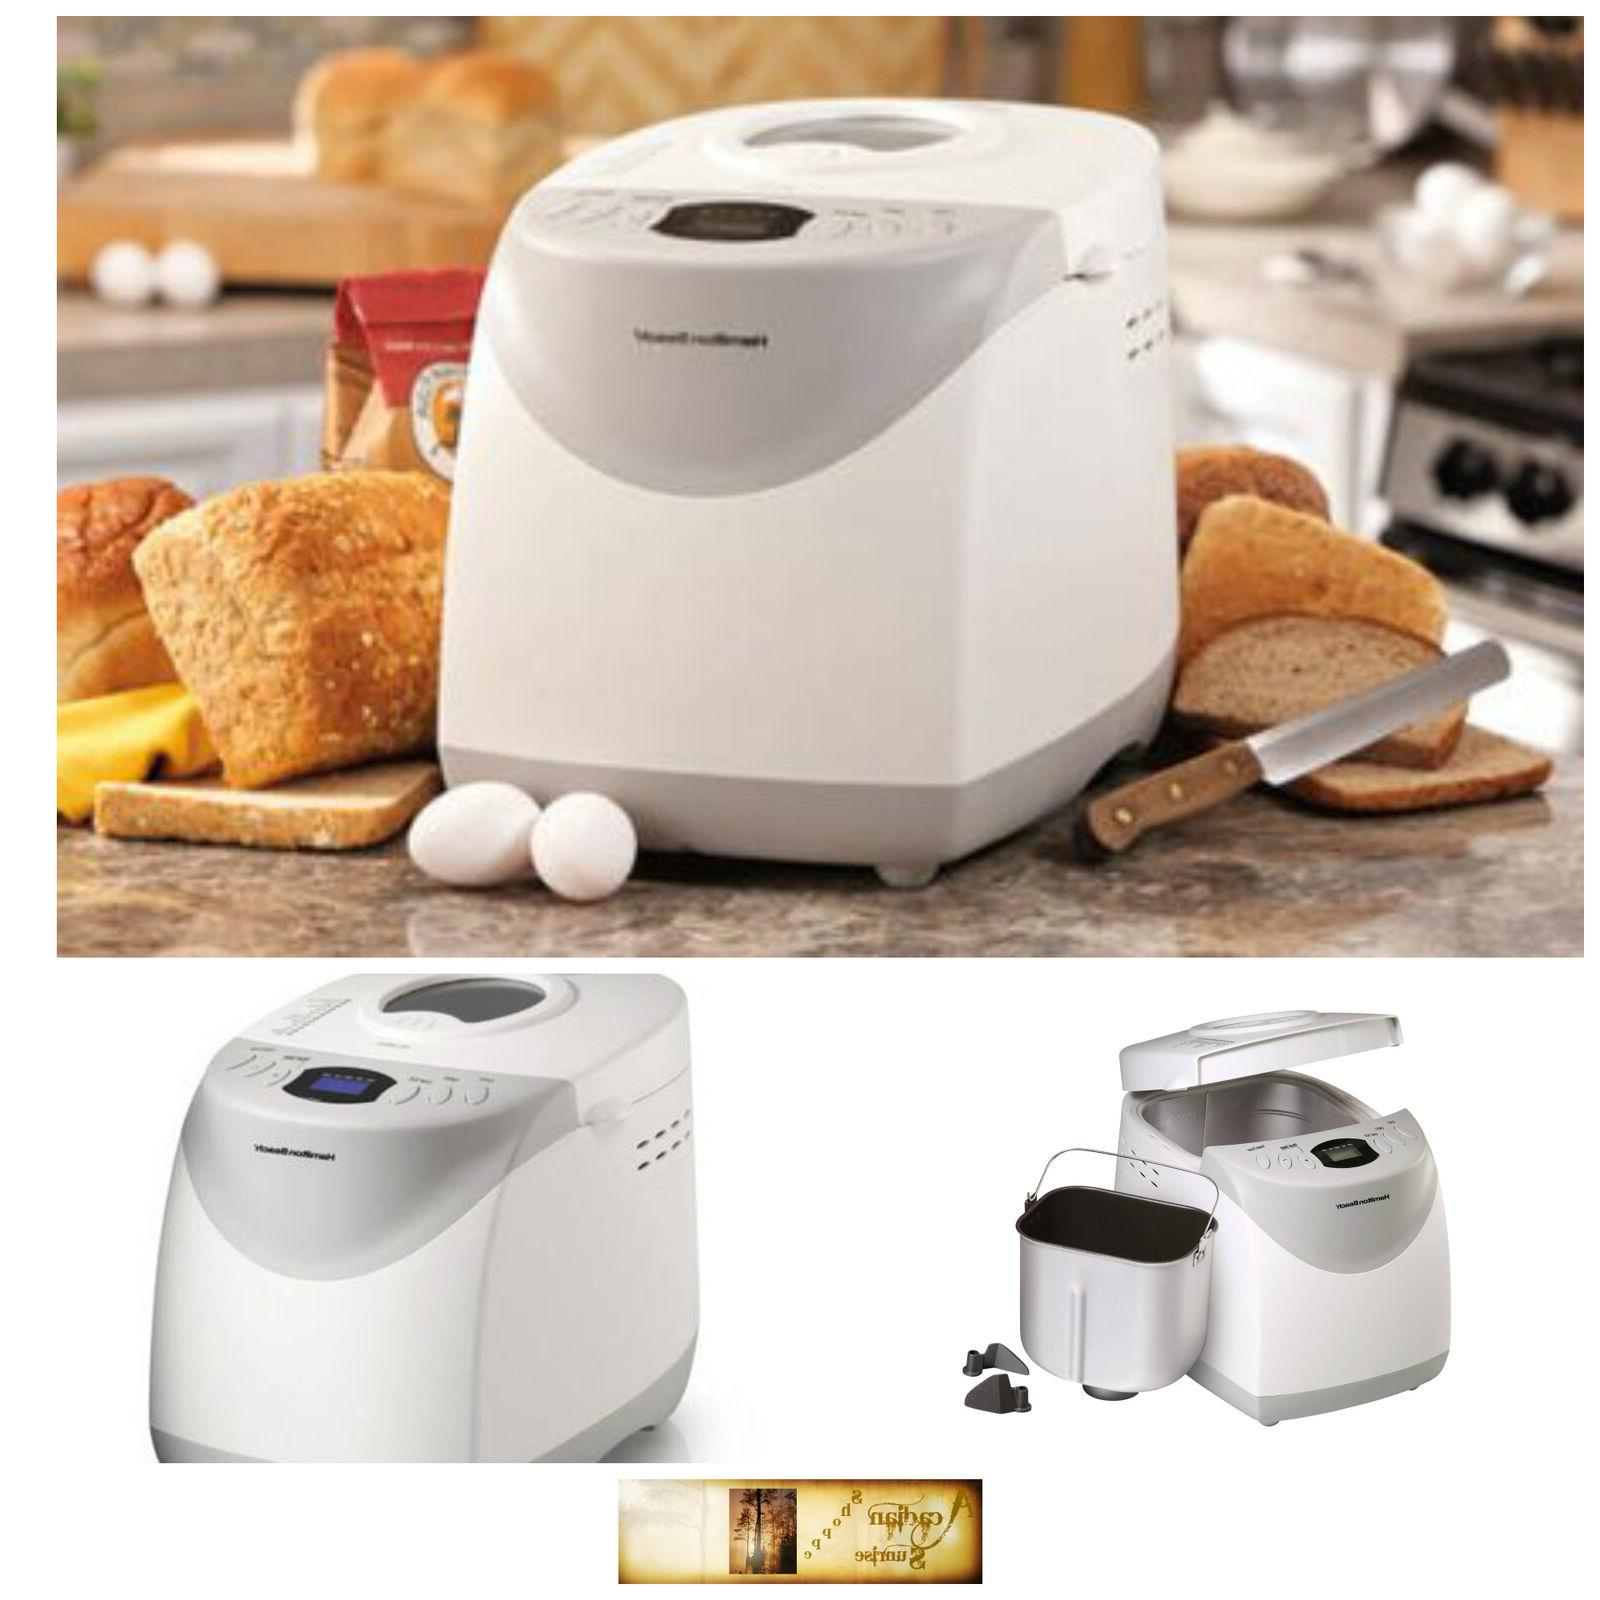 breadmaker bread making machine auto cooking home